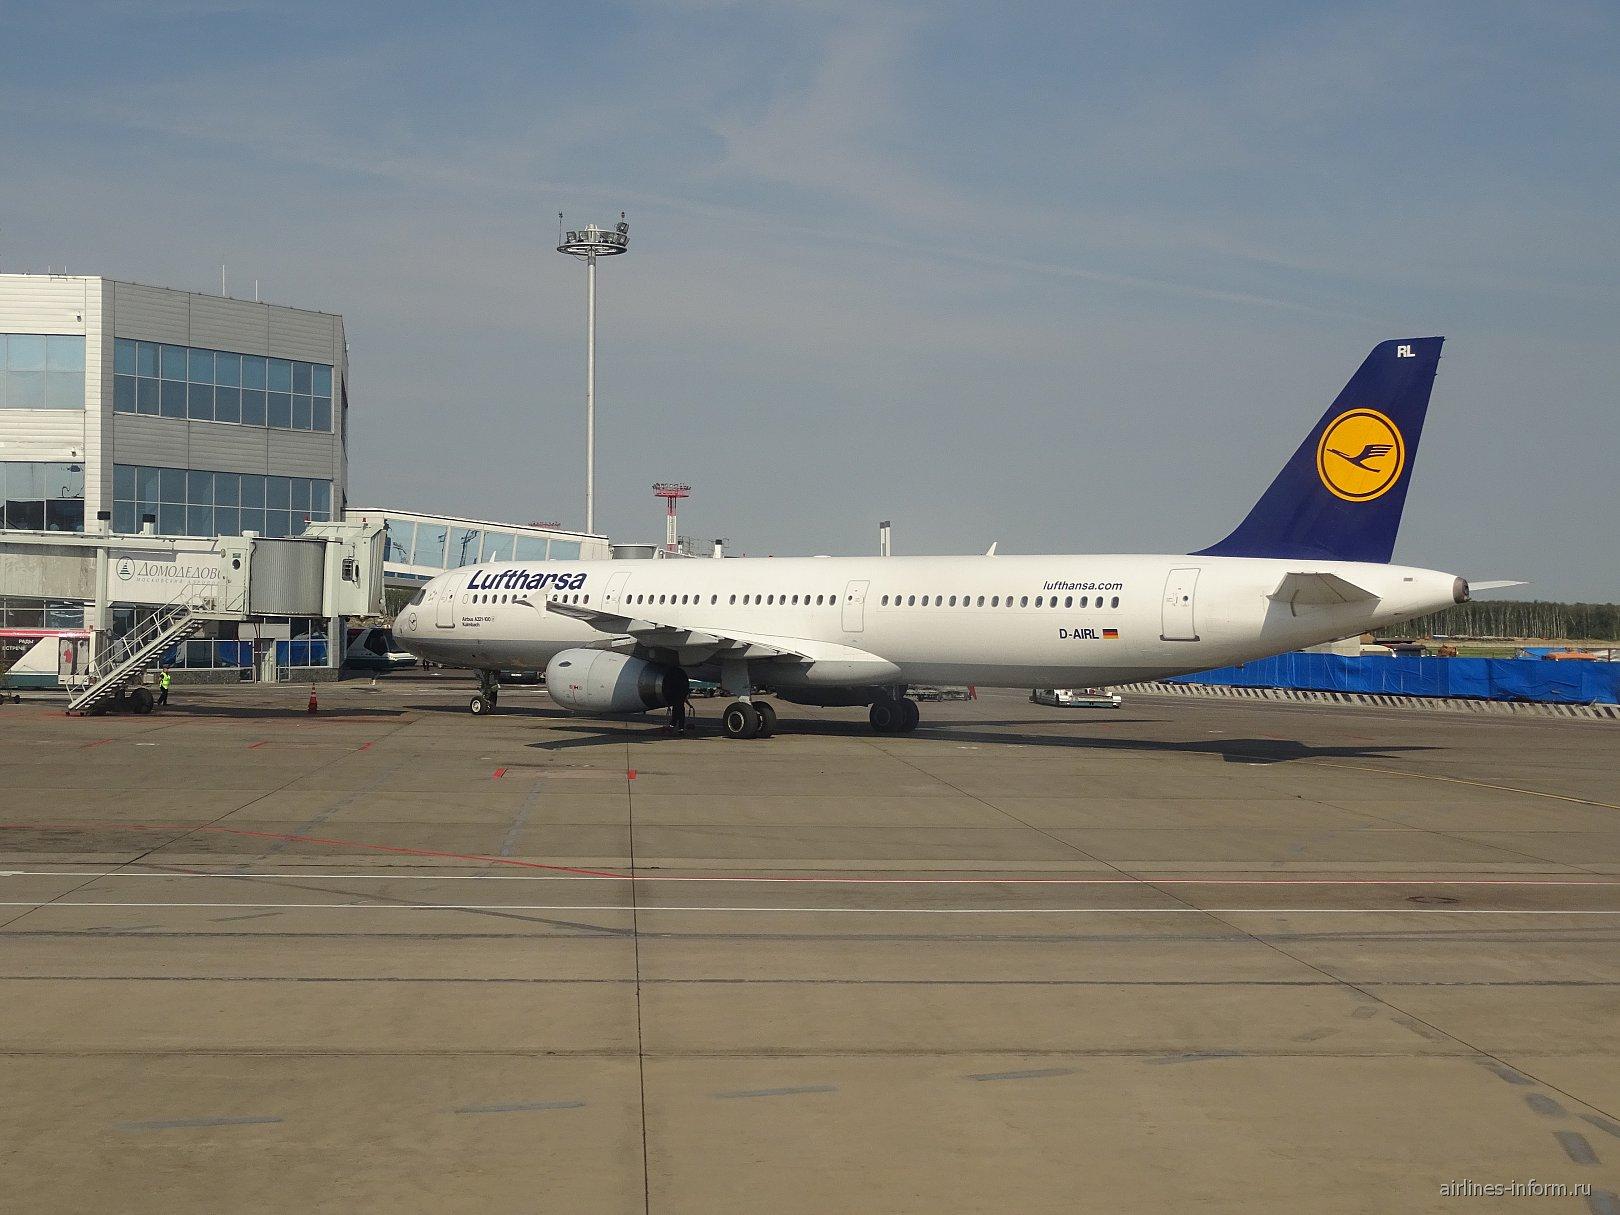 Airbus A321 авиакомпании Lufthansa в аэропорту Домодедово